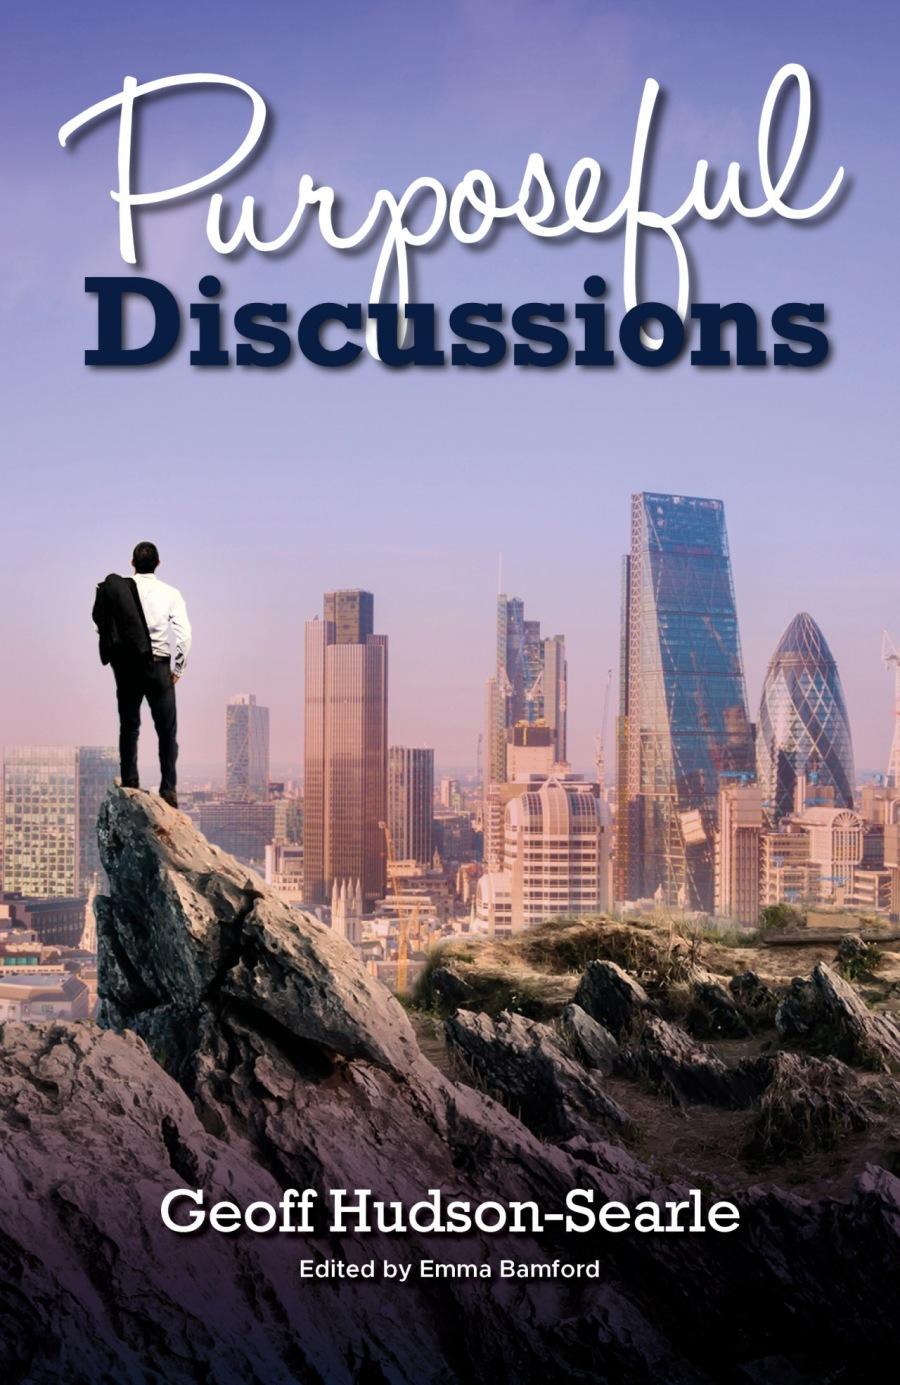 1) 199) al Fp  Discussions  Geoff Hudson-Searle  Edited by Emma Bamford